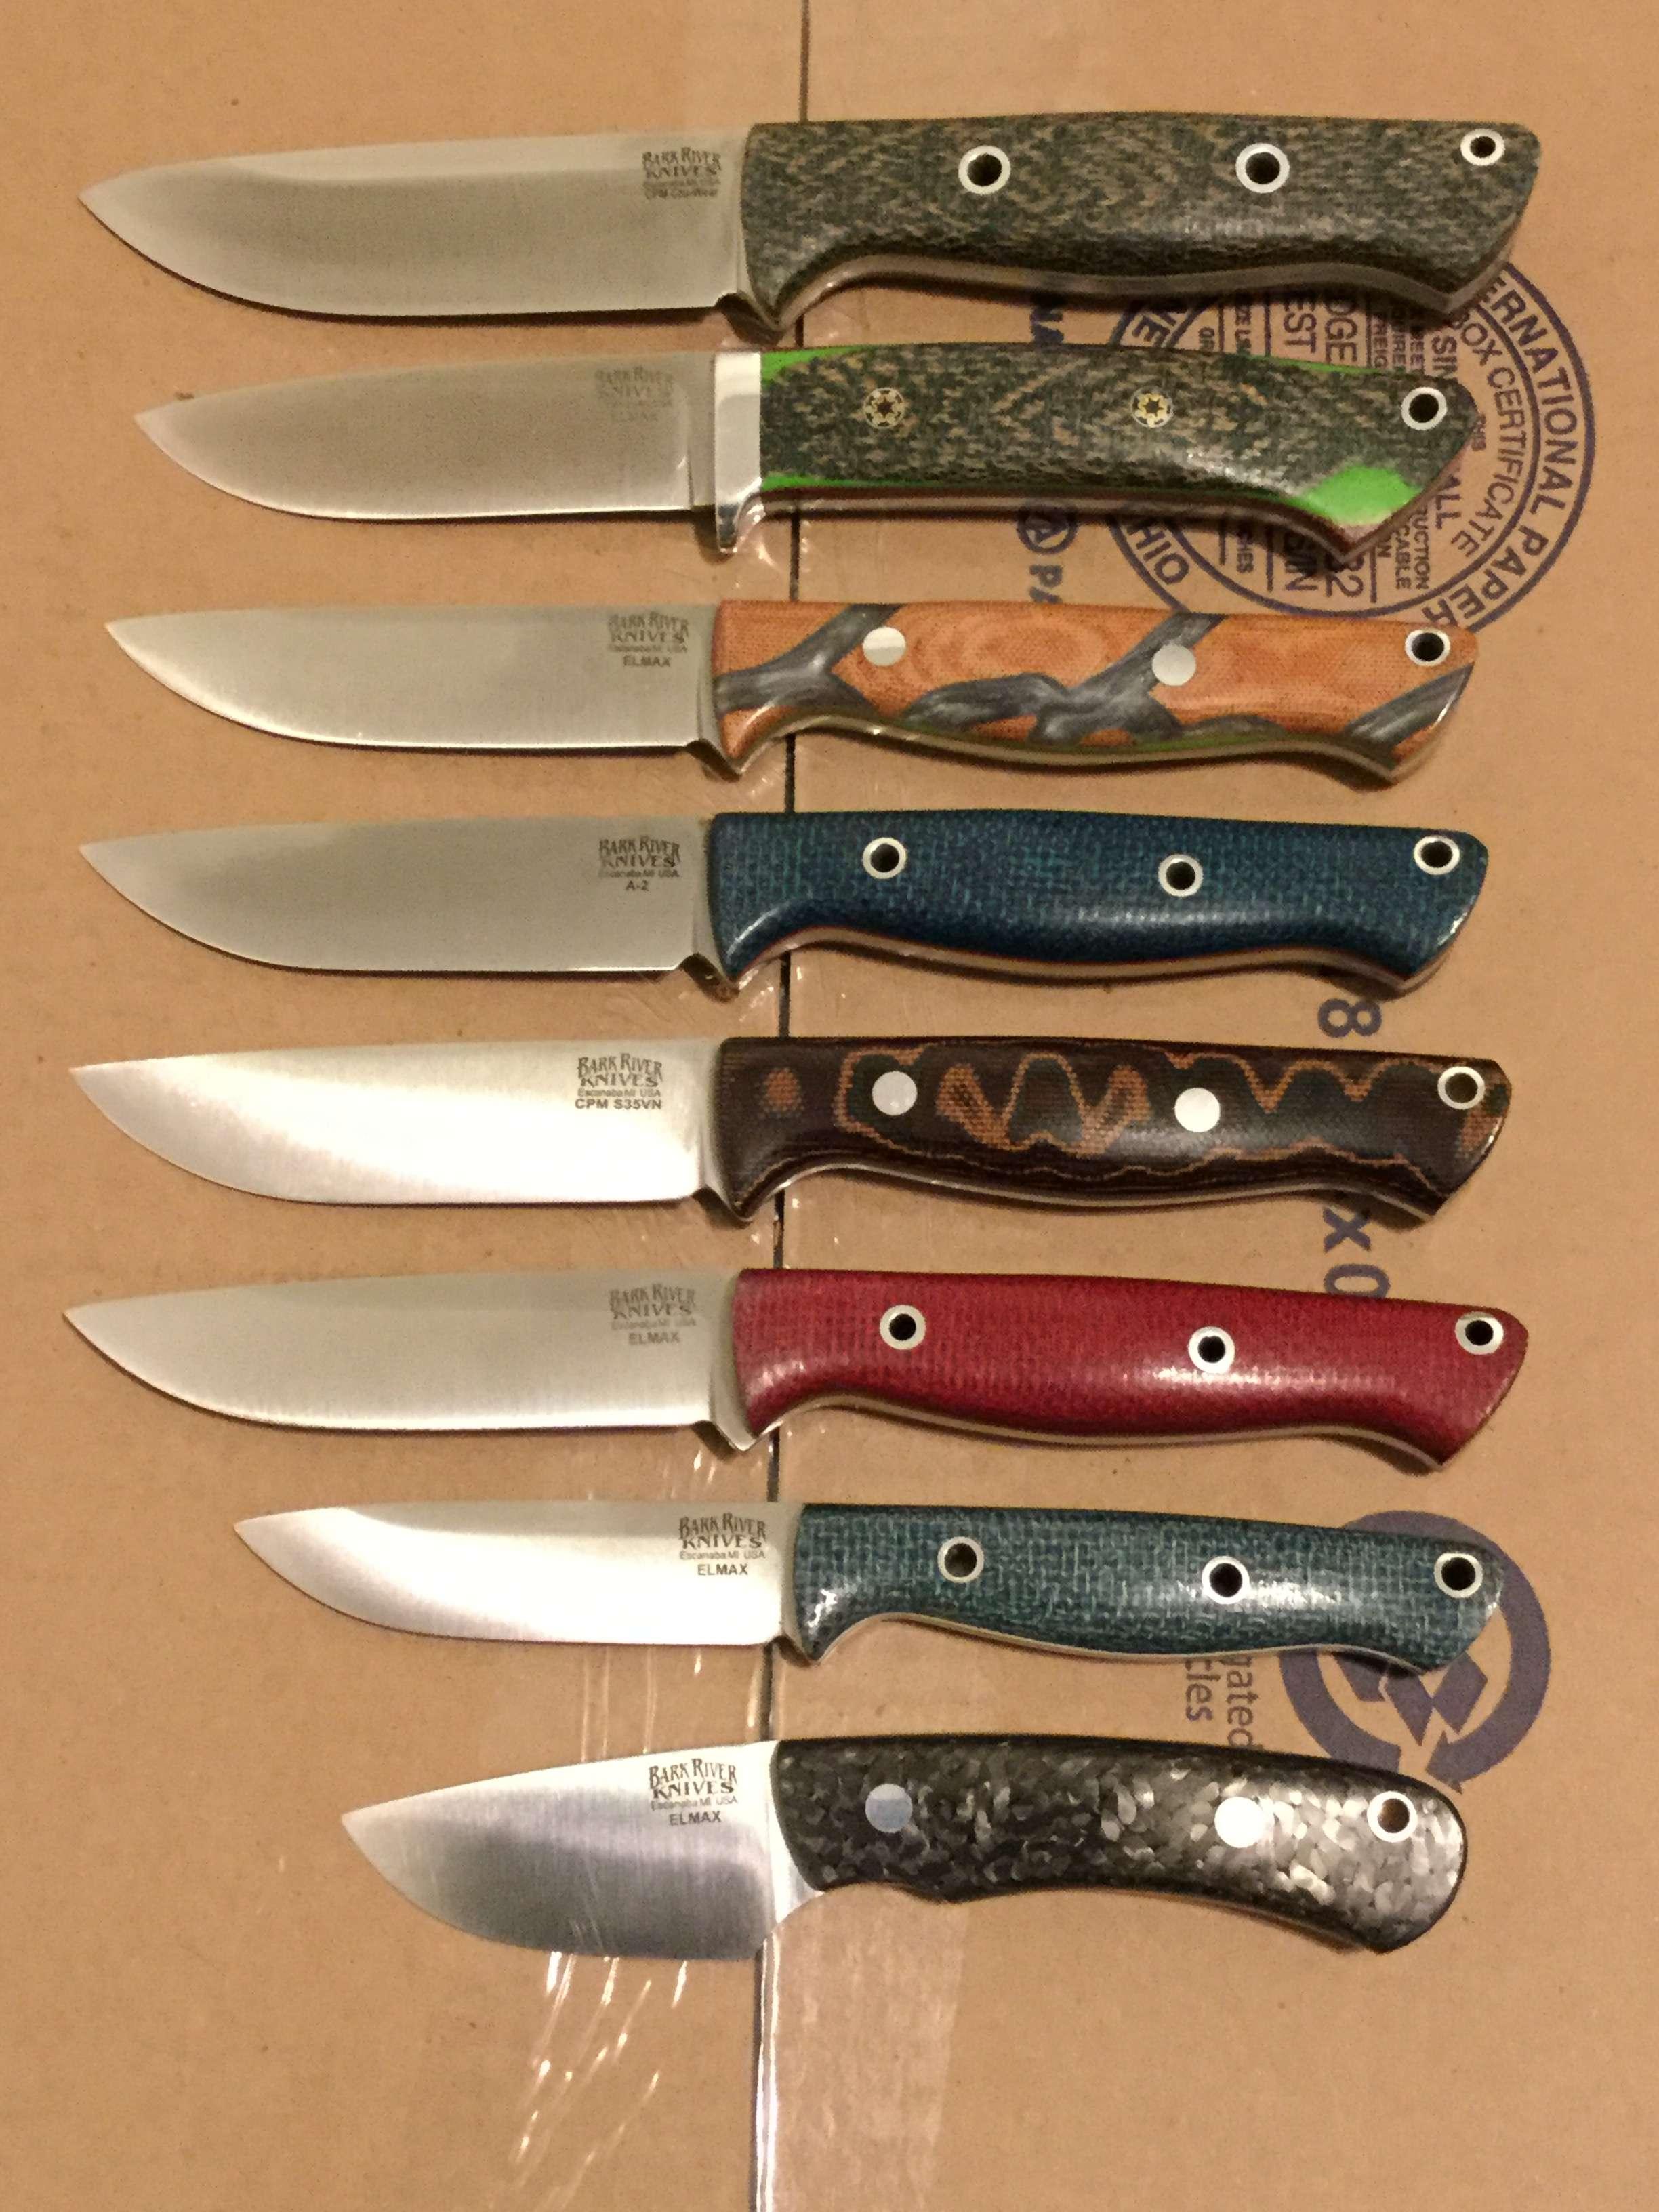 Gentlemen, recommend 1st bark river knife - AR15 COM